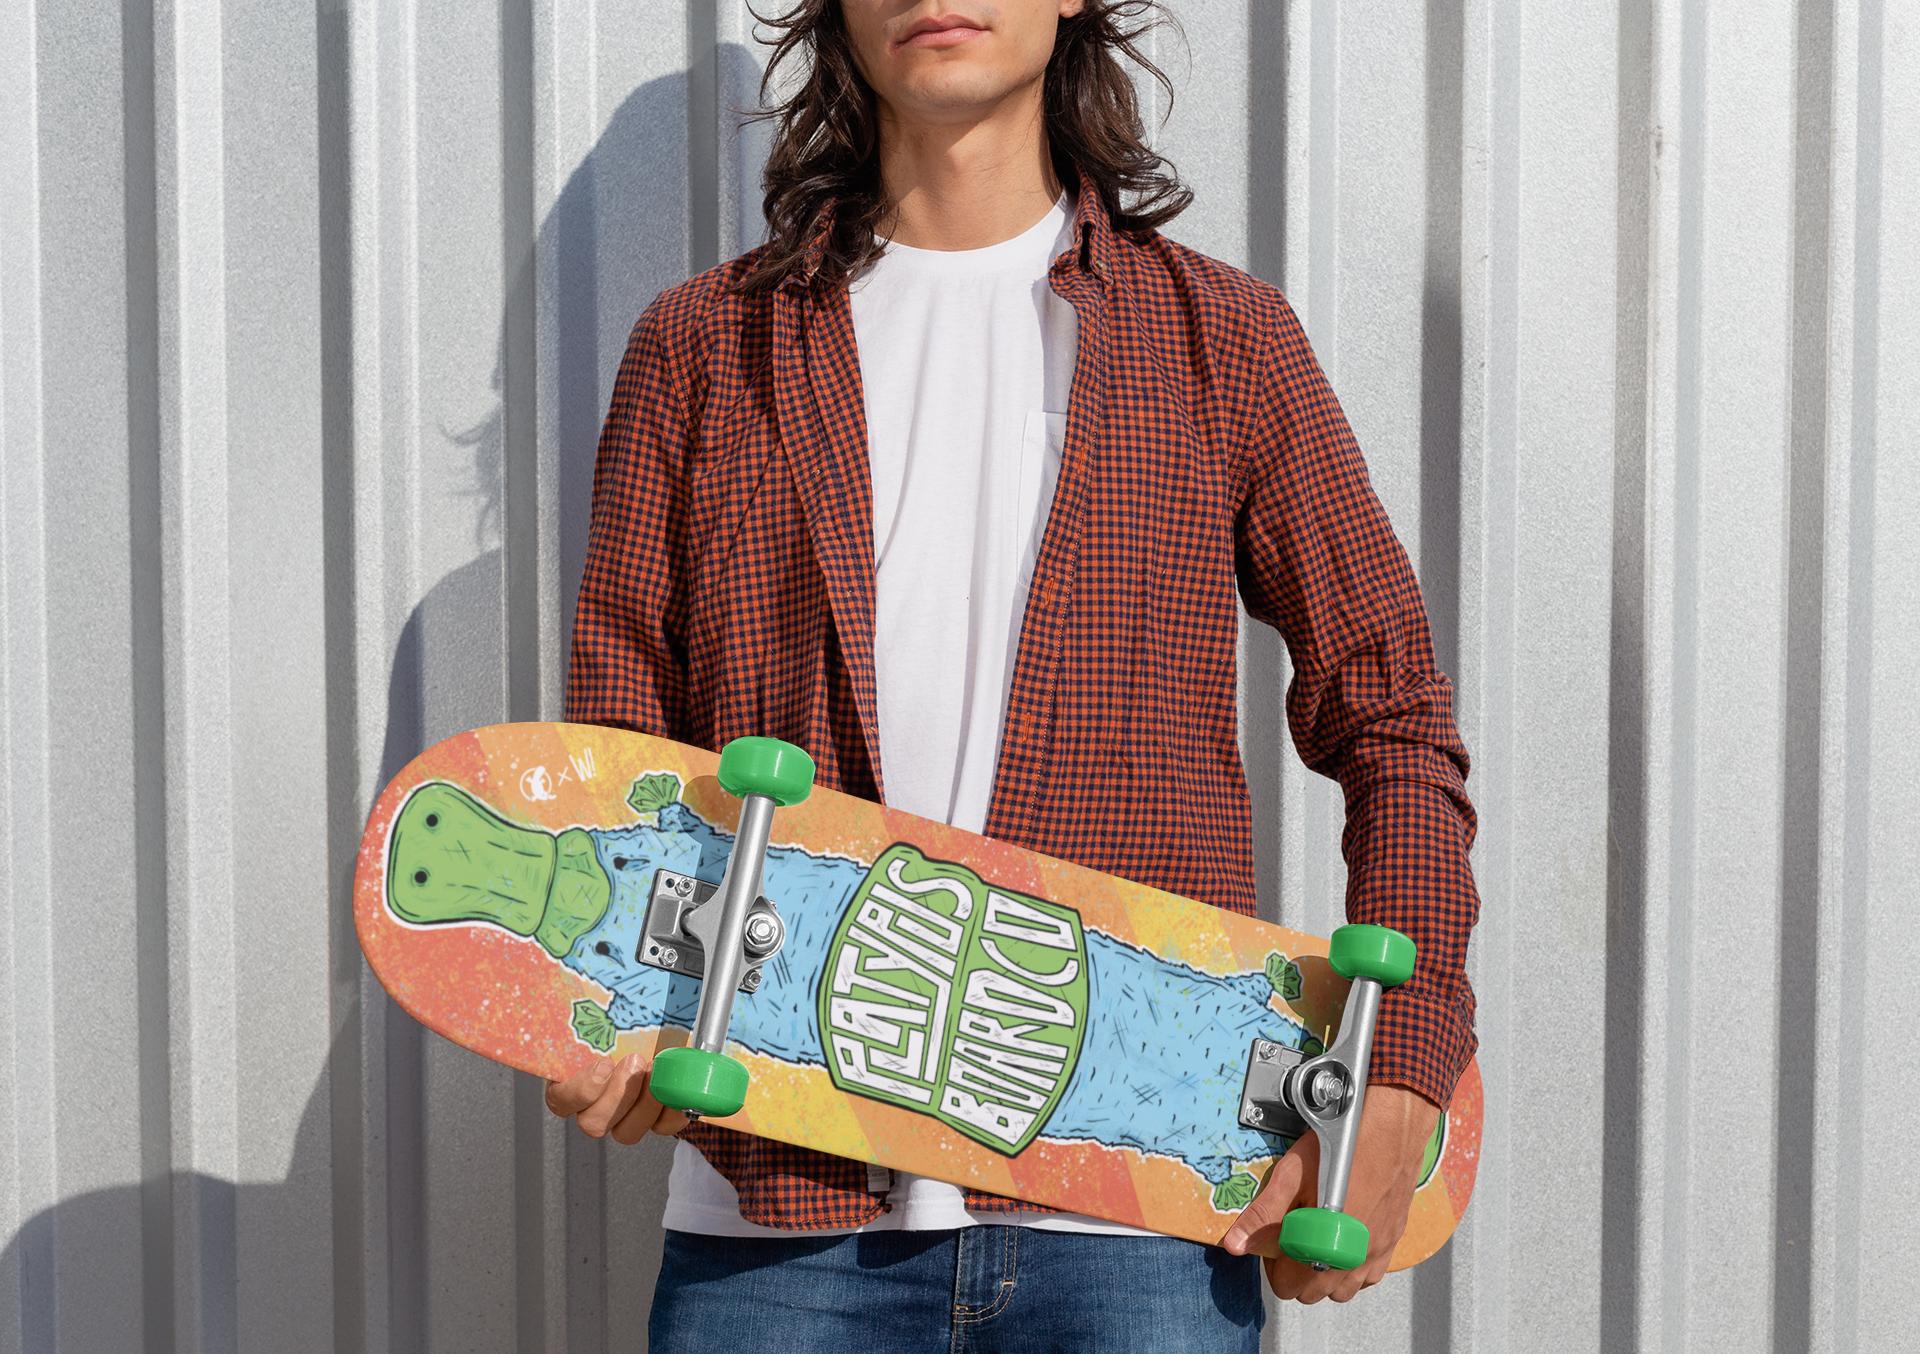 mockup-of-a-rebel-man-holding-a-skateboard-27201.png